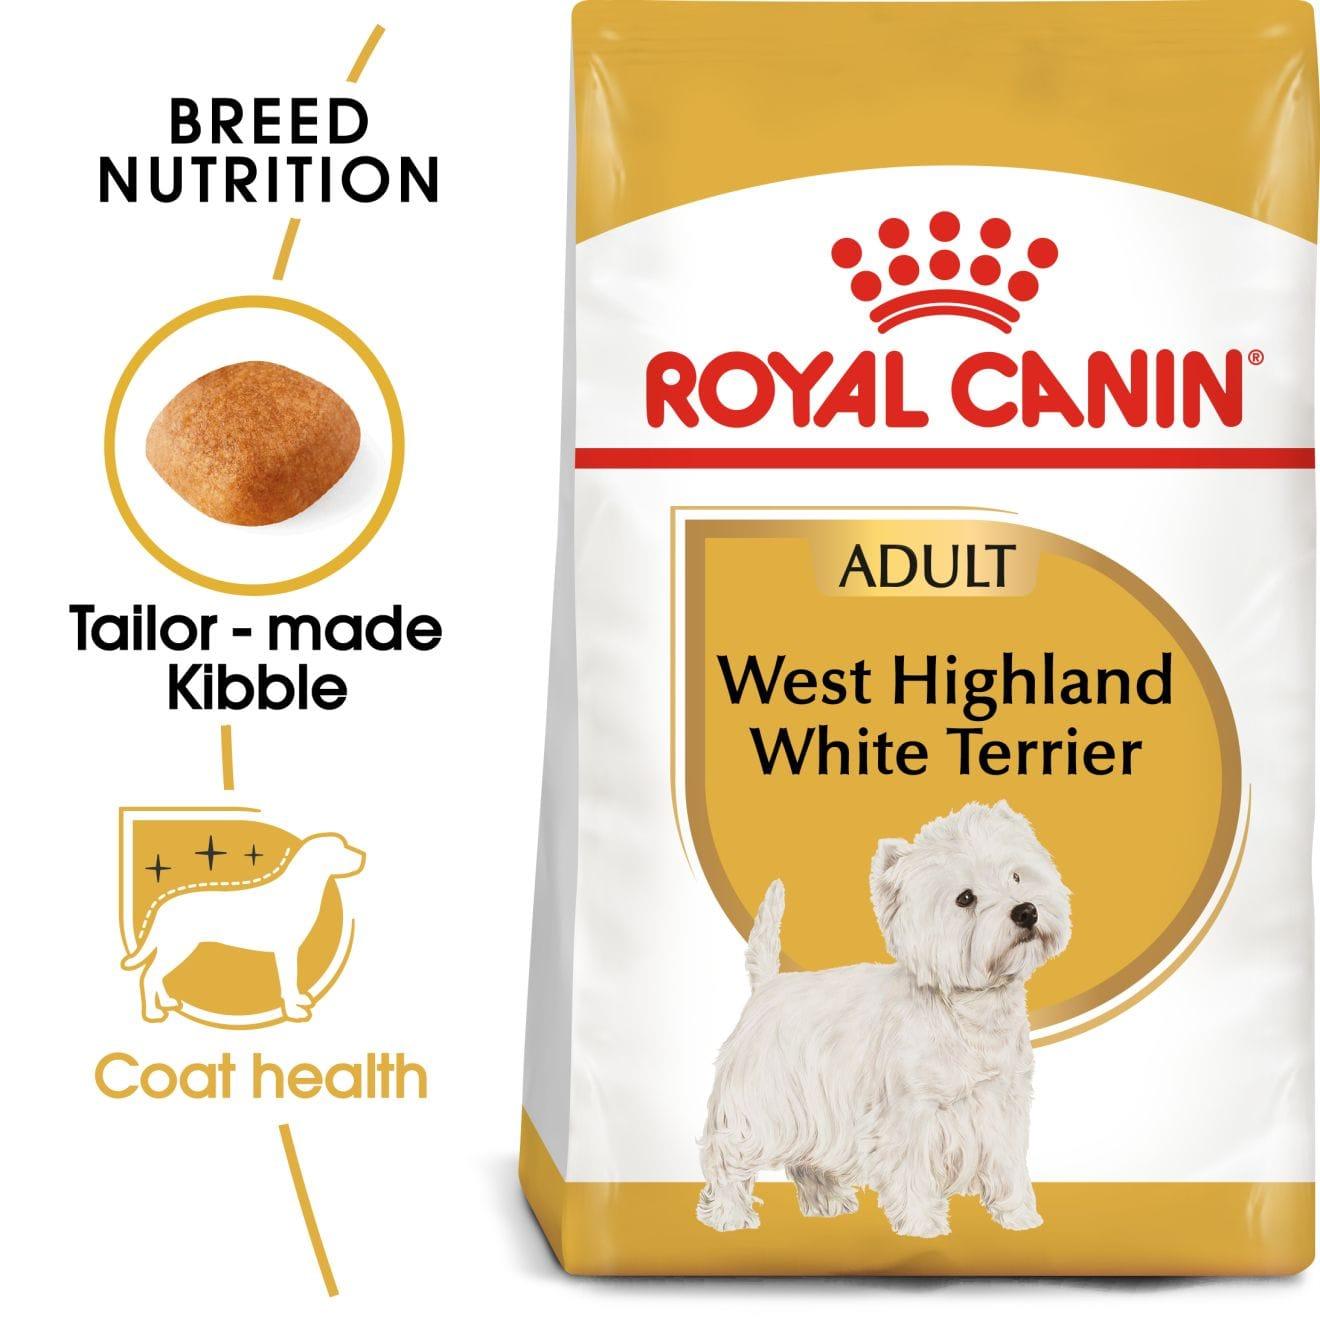 Royal Canin Fussy Eater Dog